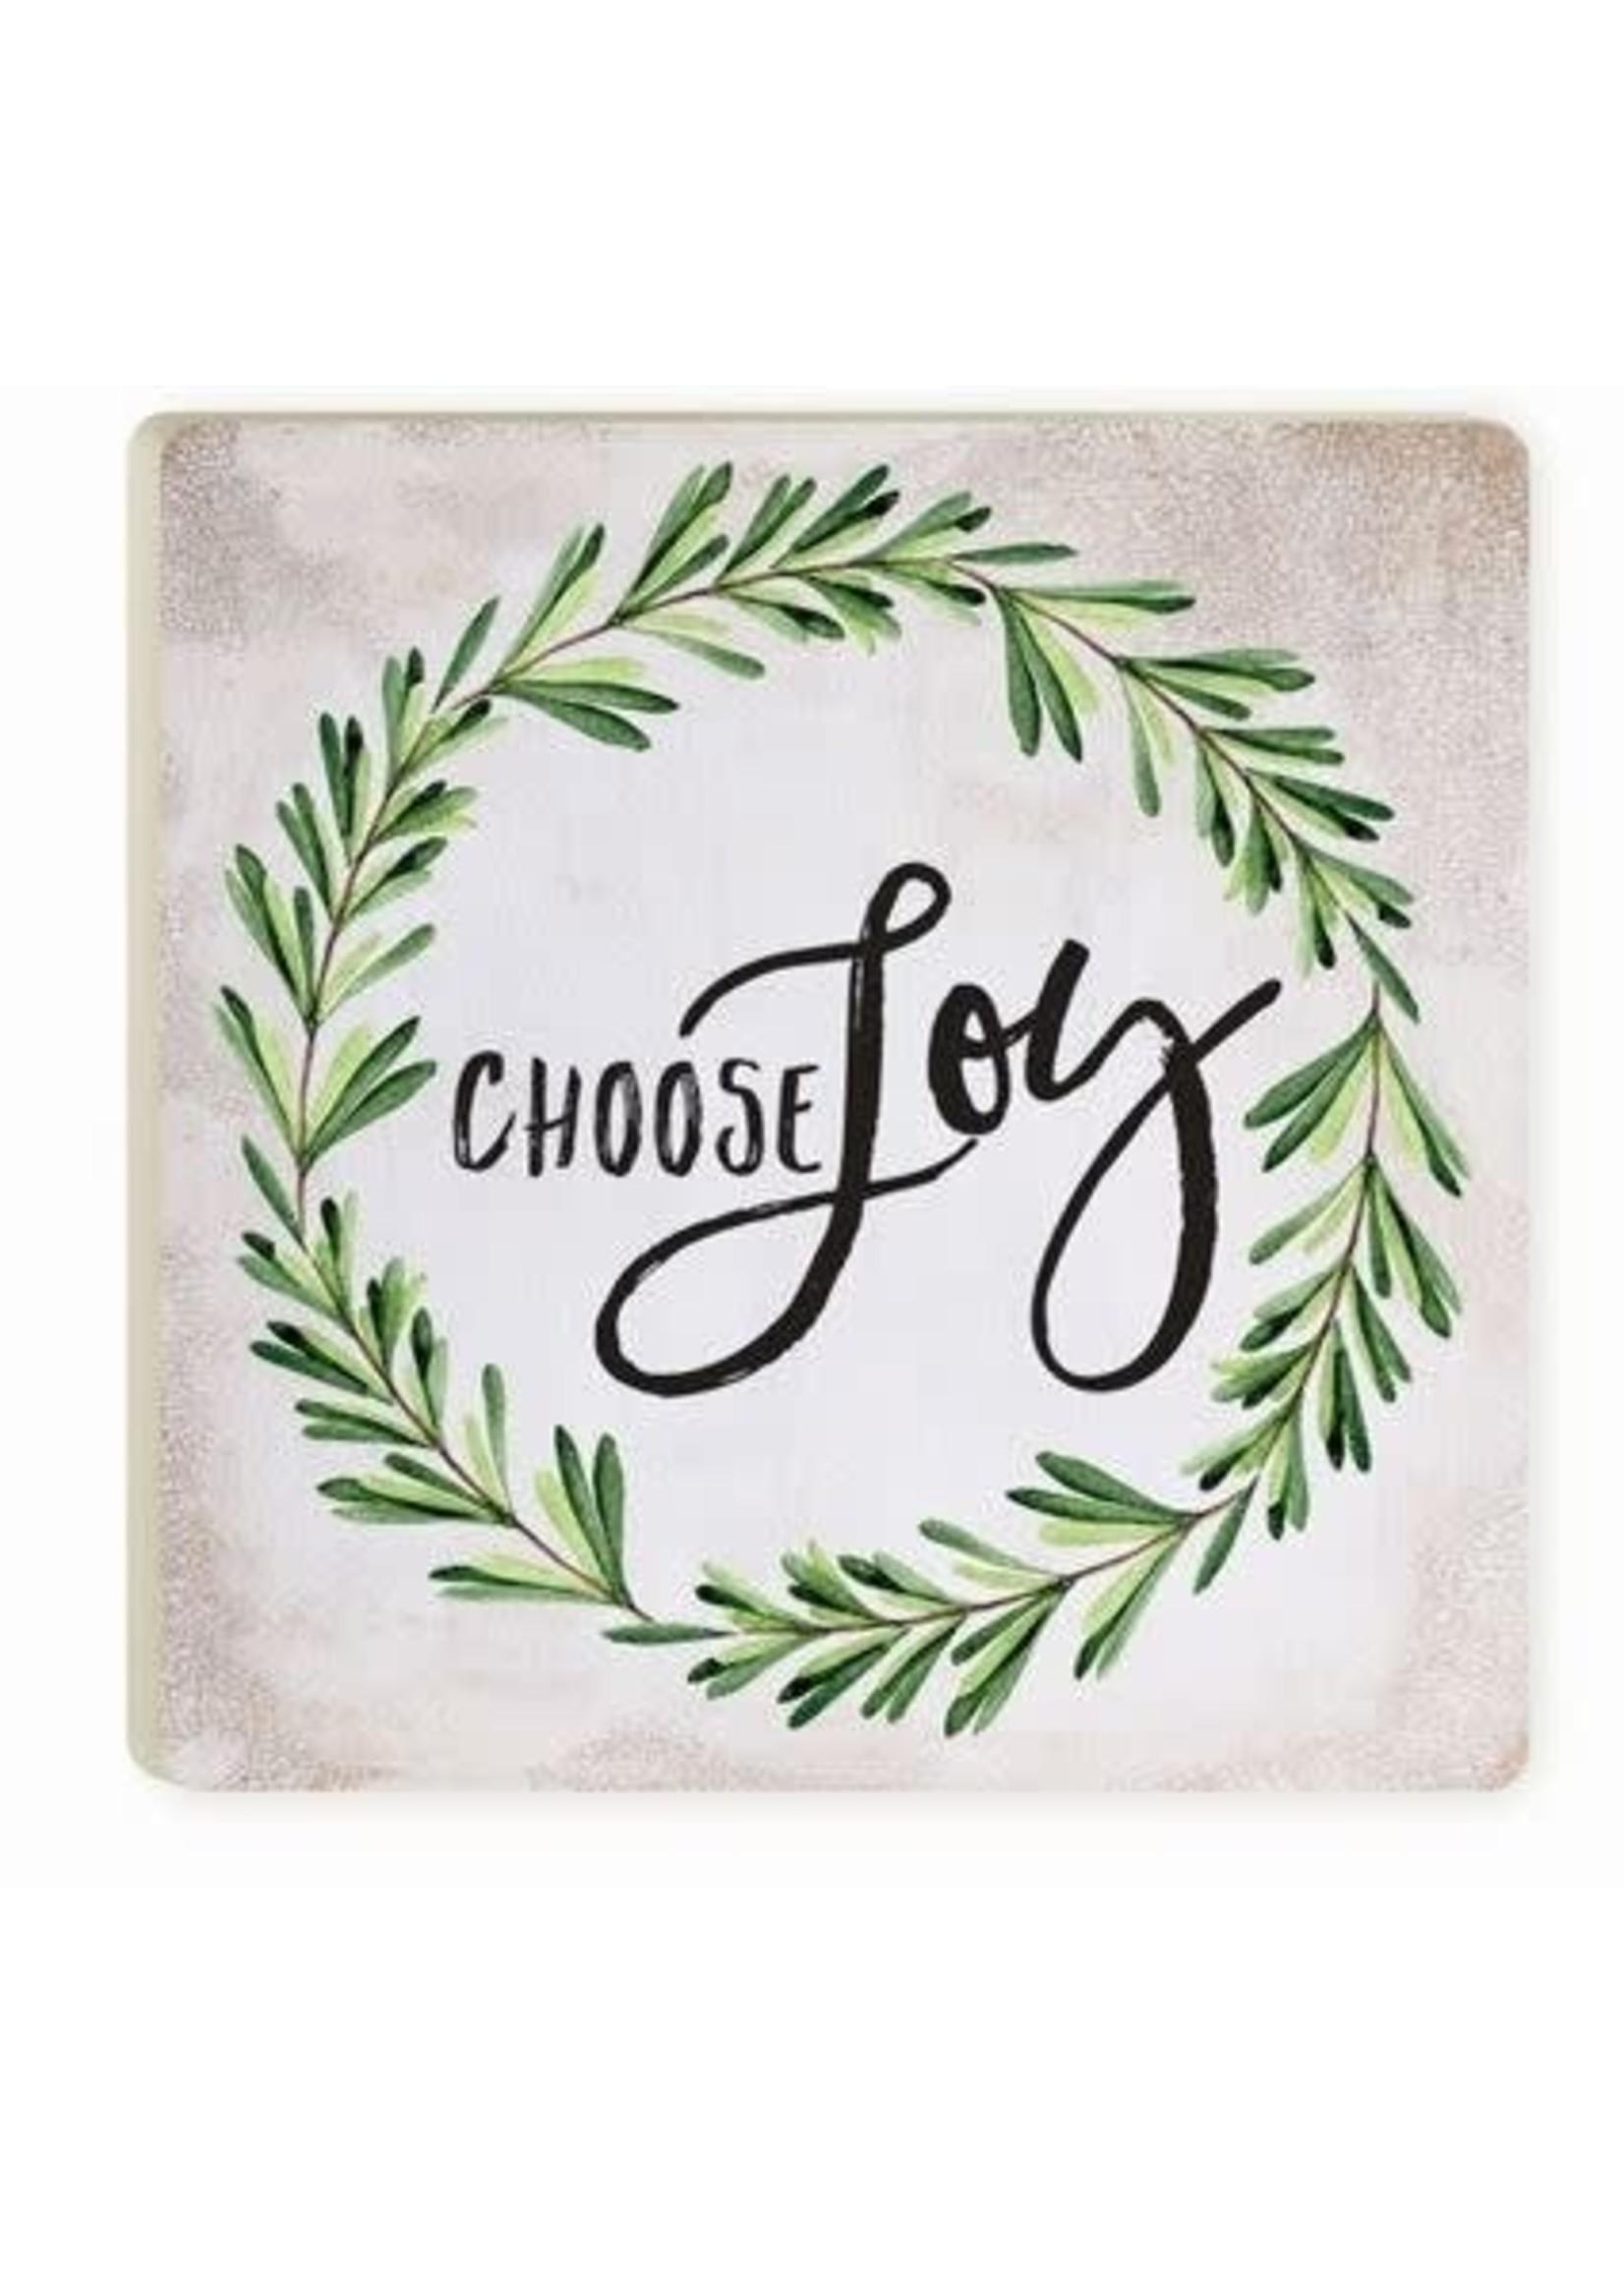 Choose Joy Coaster Pack